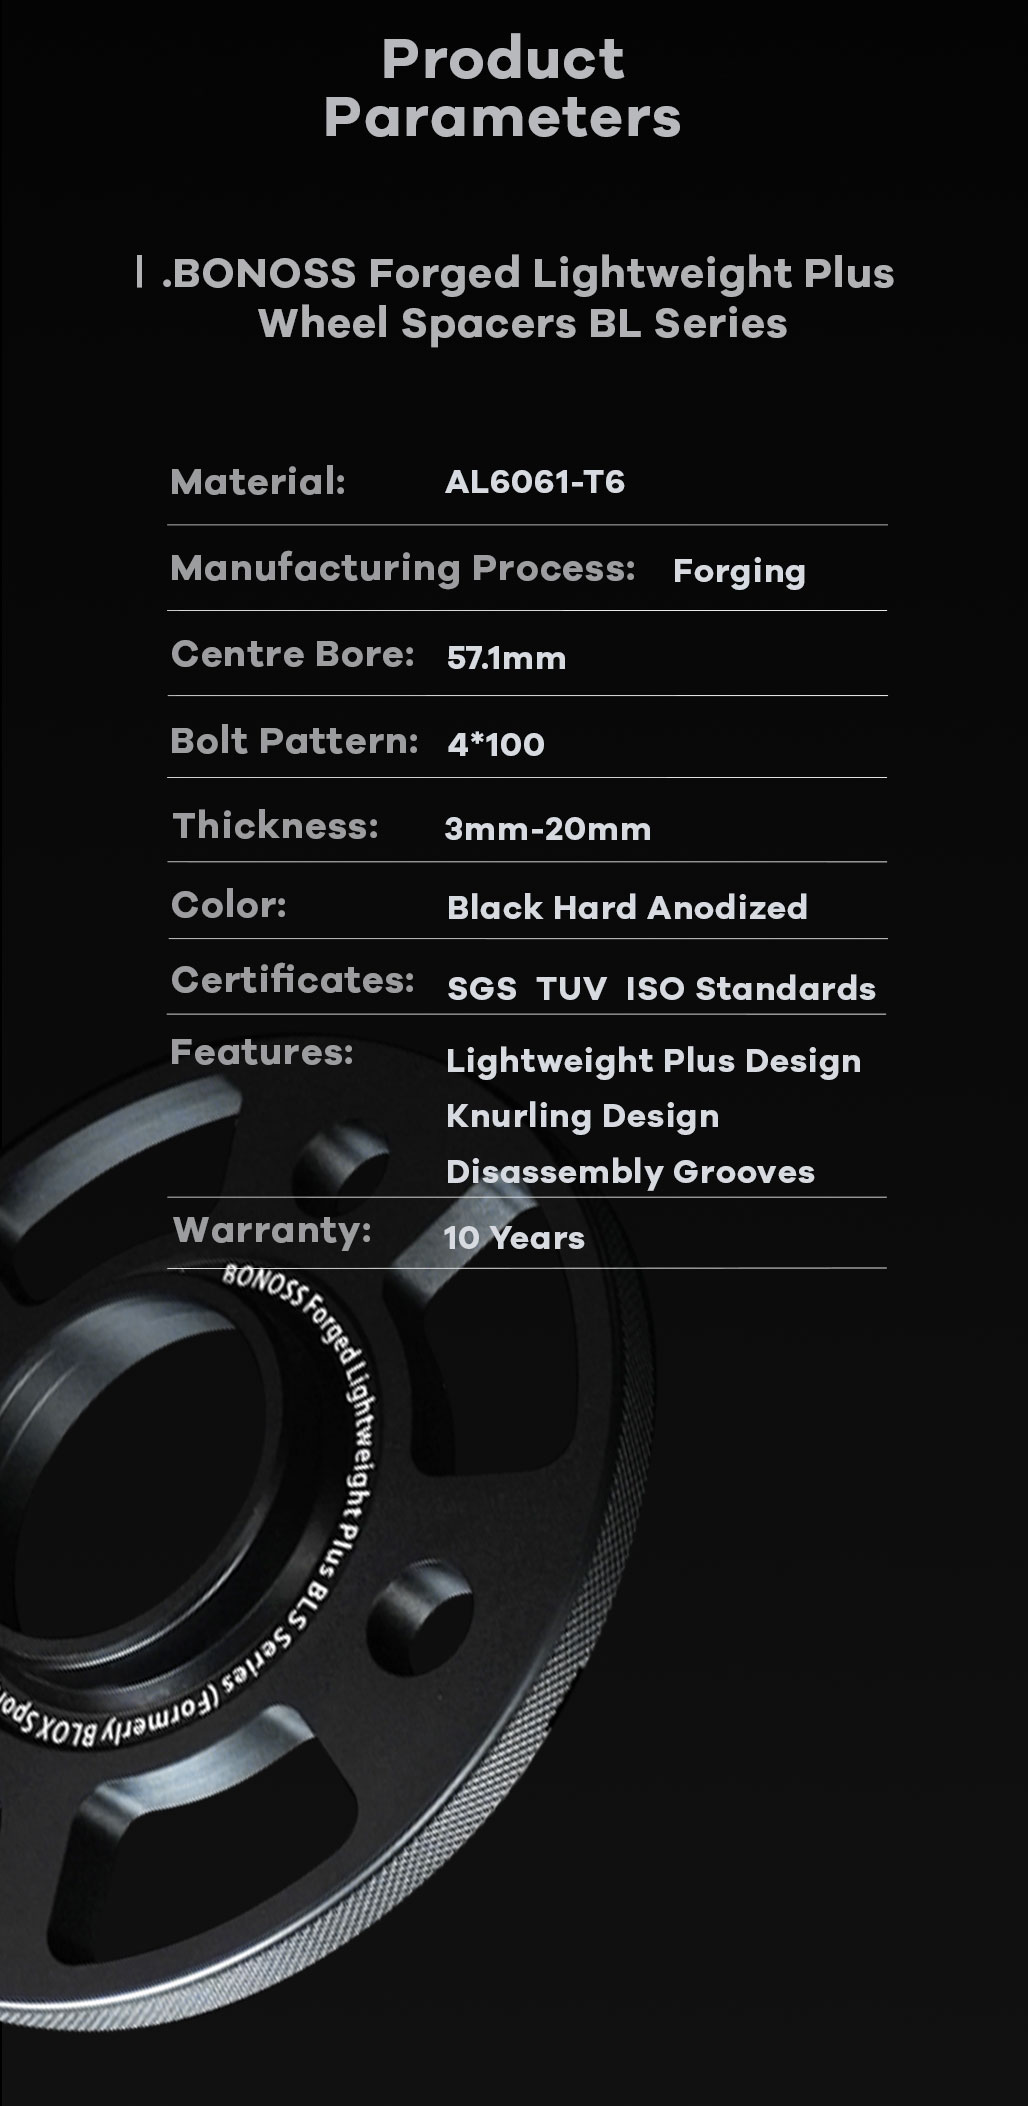 AL6061-T6-BONOSS-forged-lightweight-plus-4x100-57.1-bmw-e21-e30-by-lulu-9